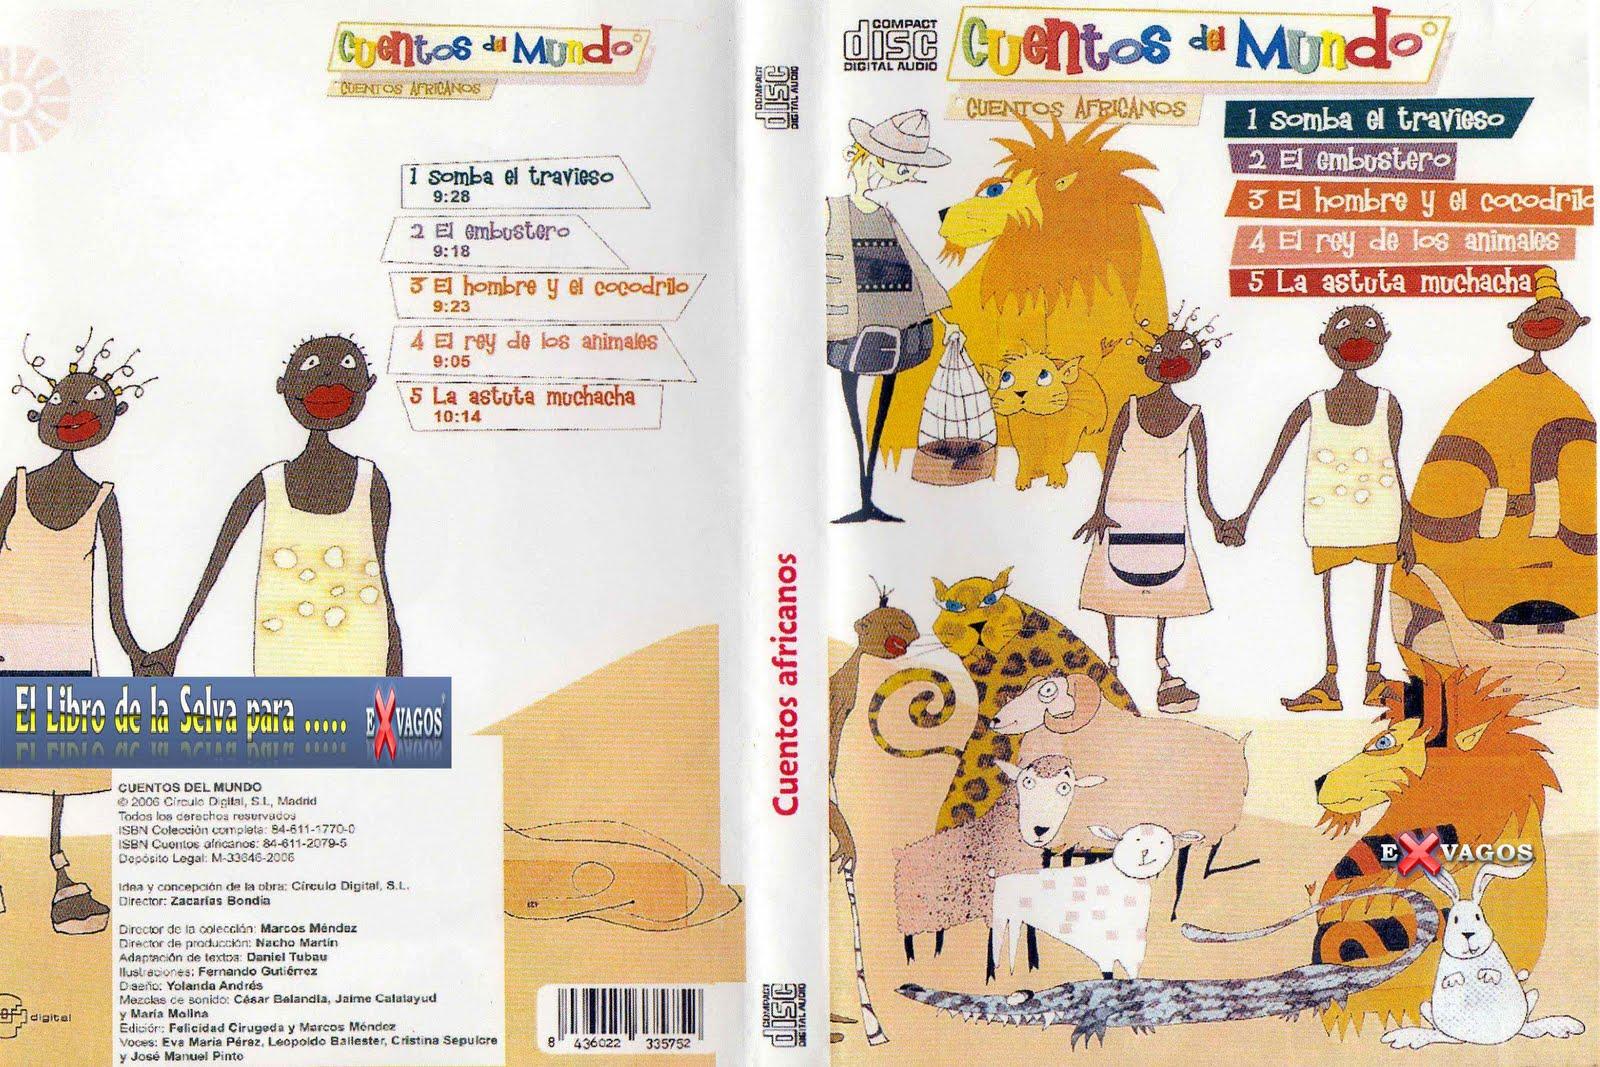 musica tradicion japon mp3: